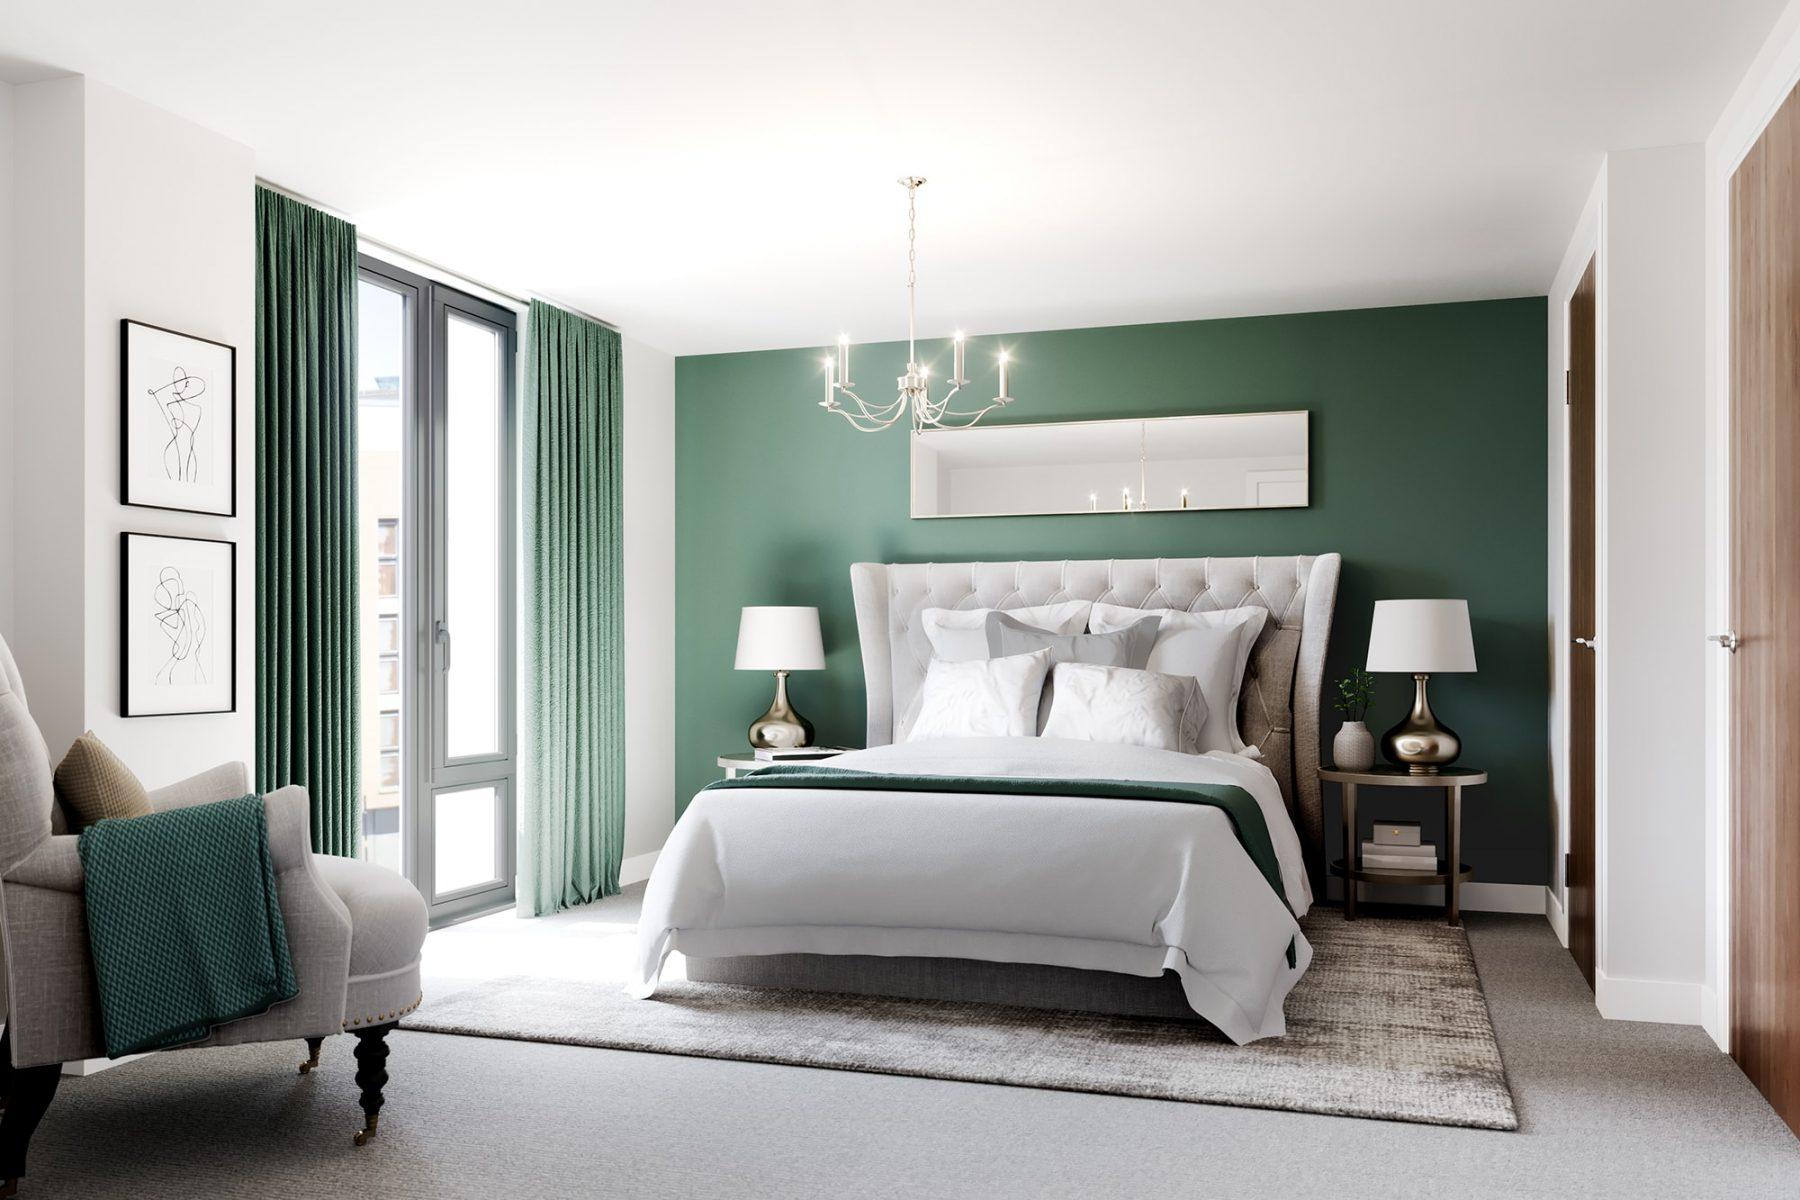 Apartment bedroom Birmingham